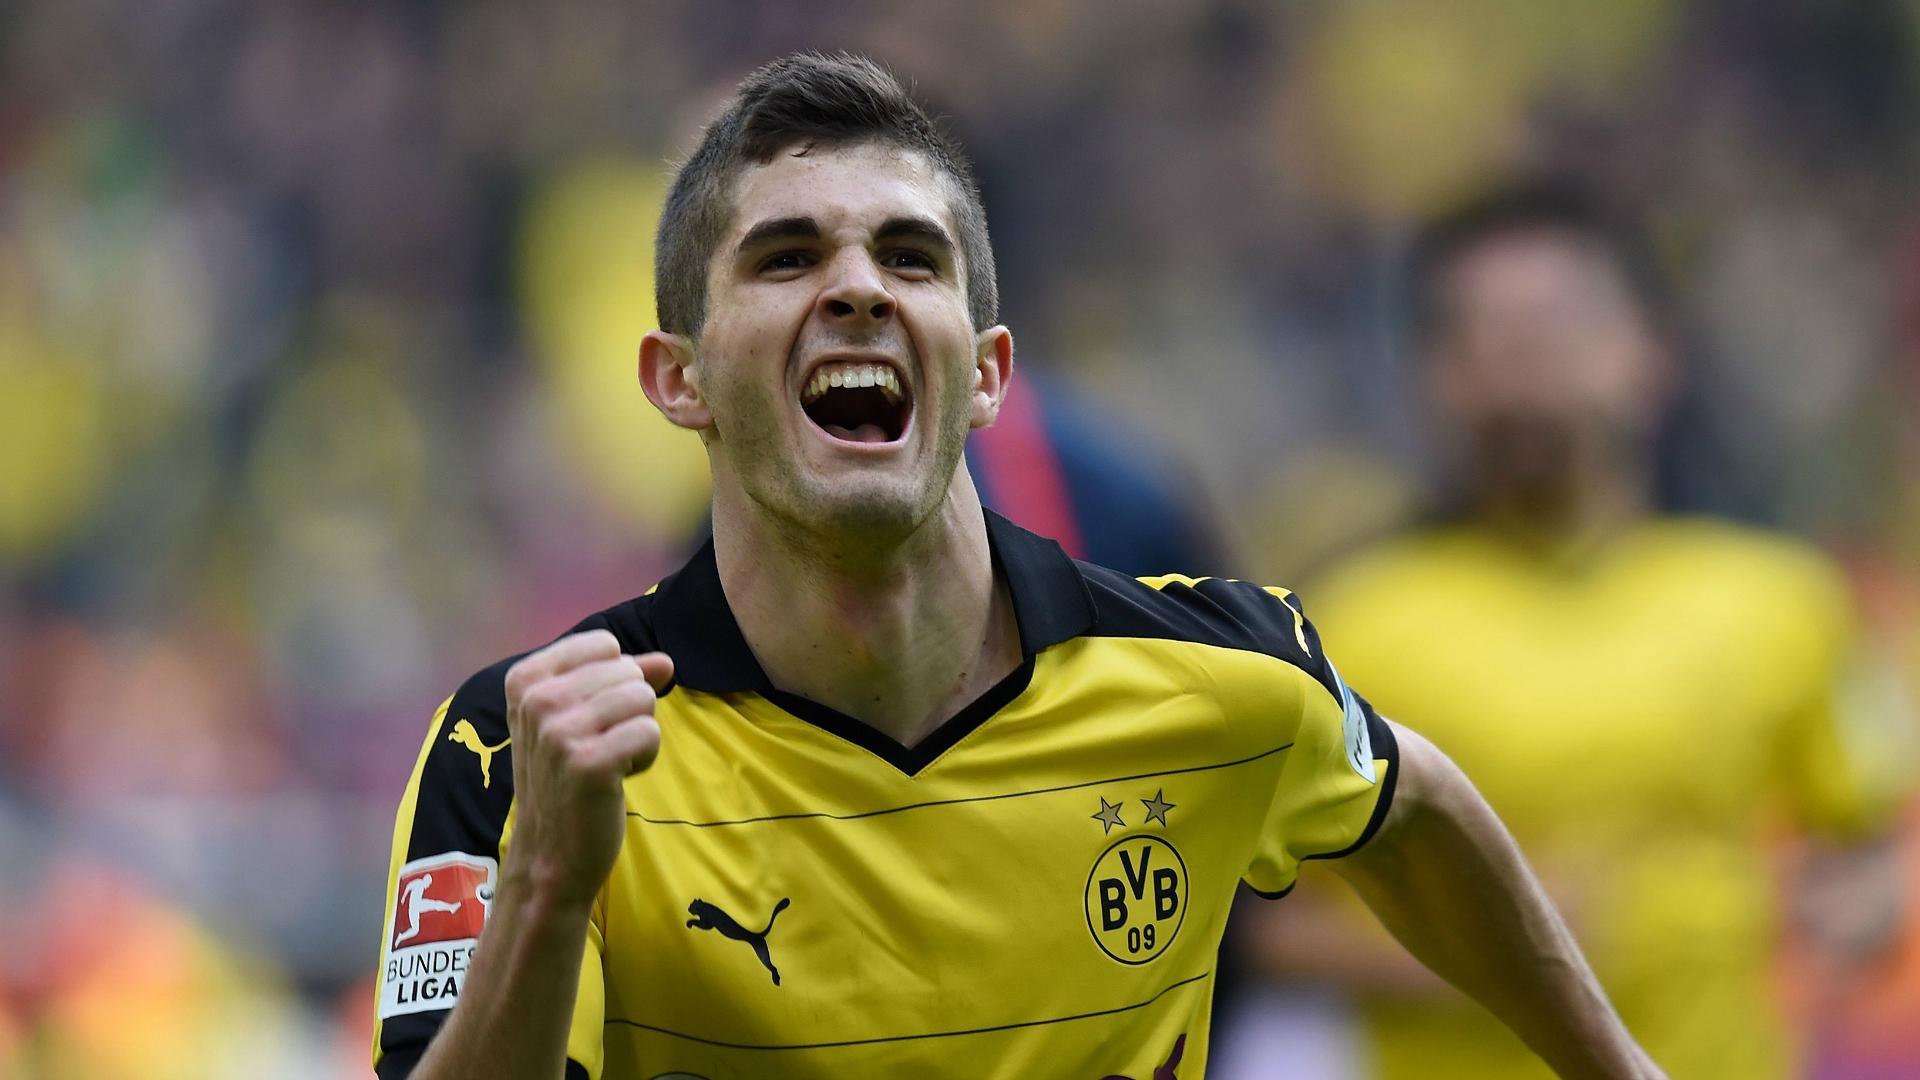 Christian Pulisic, Borussia Dortmund